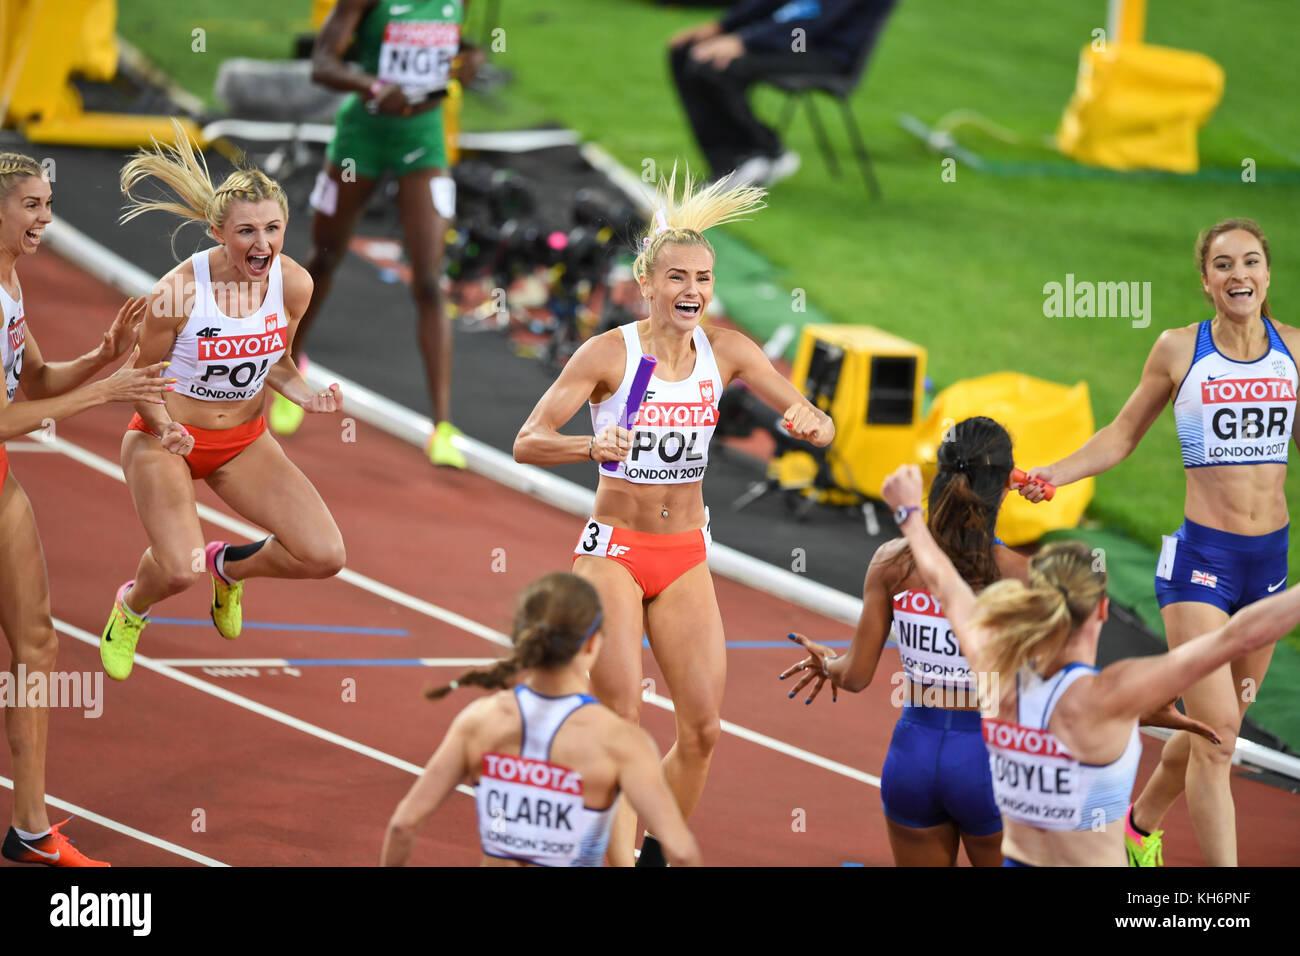 Polish team celebration - 4x400 Metres Relay women - IAAF World Championships - London 2017 Stock Photo